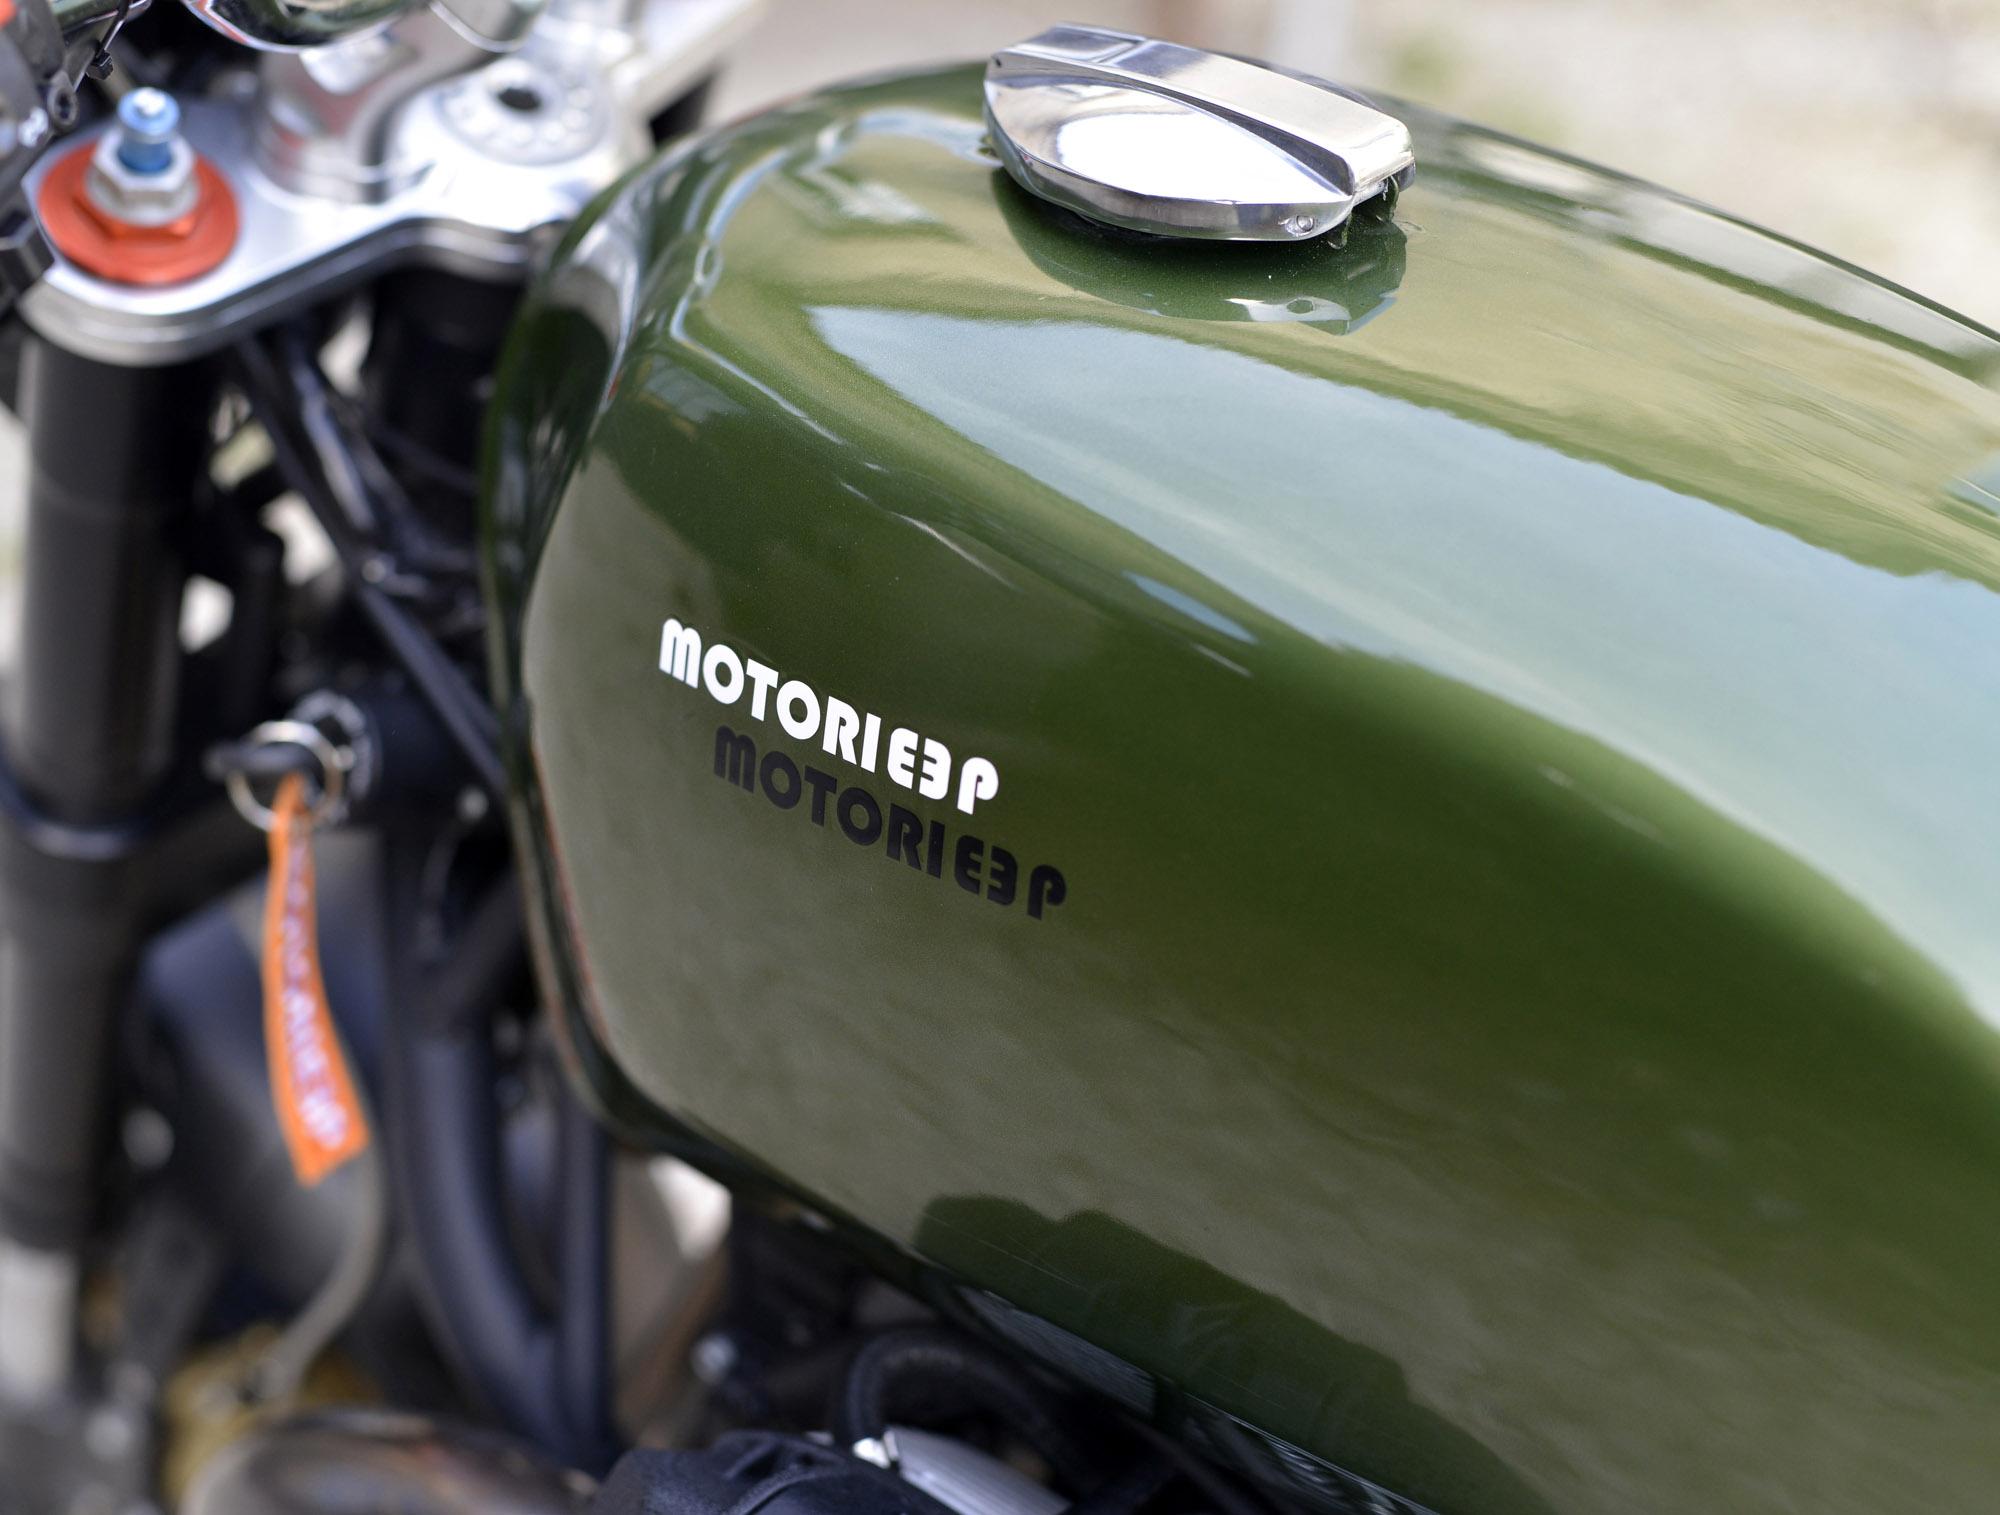 Motorieep Moto guzi Griso 1